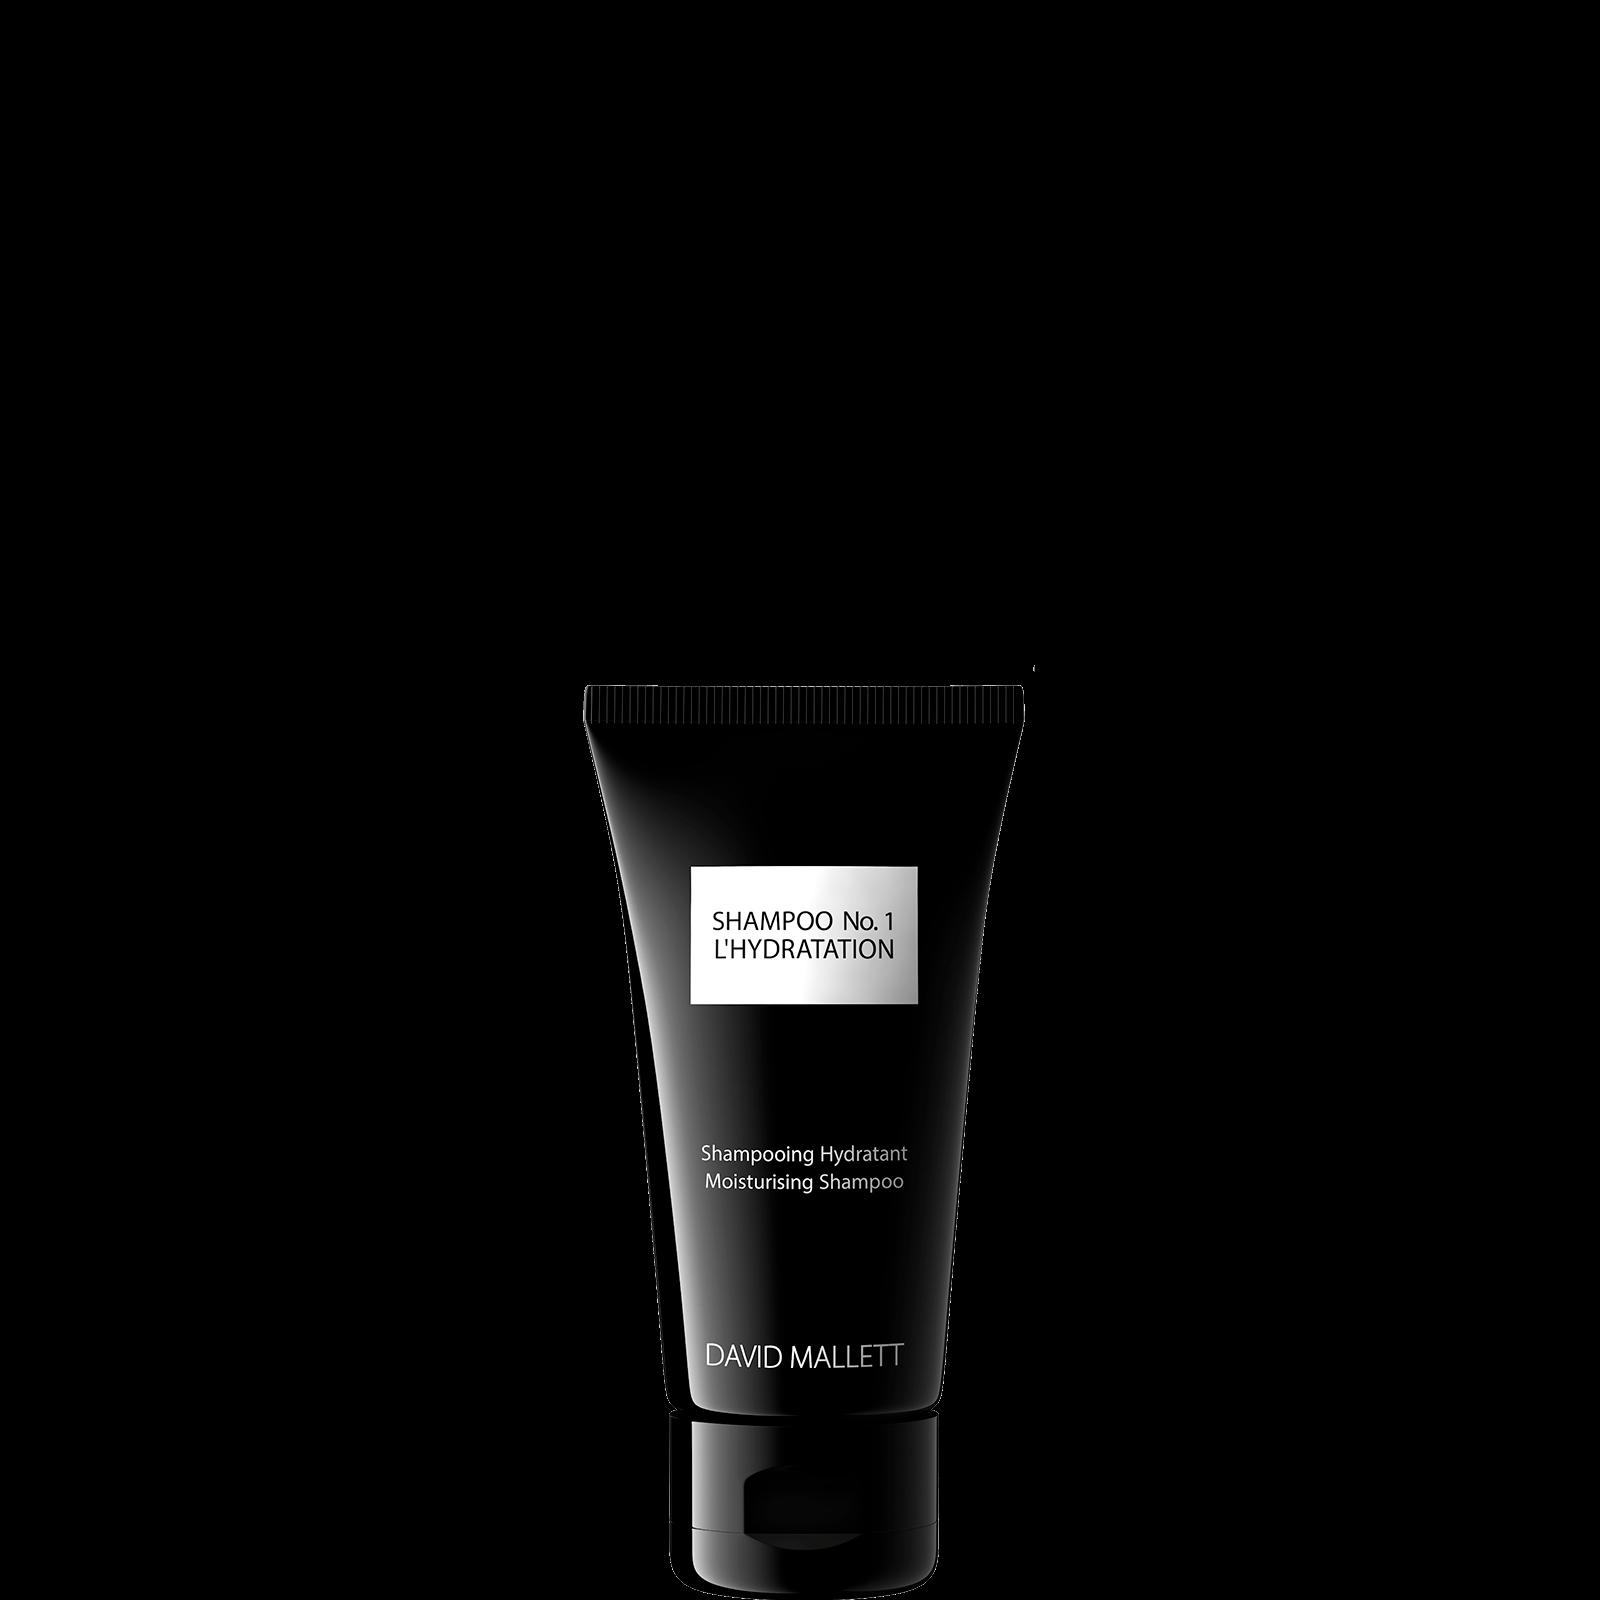 Image produit: Shampoo No. 1